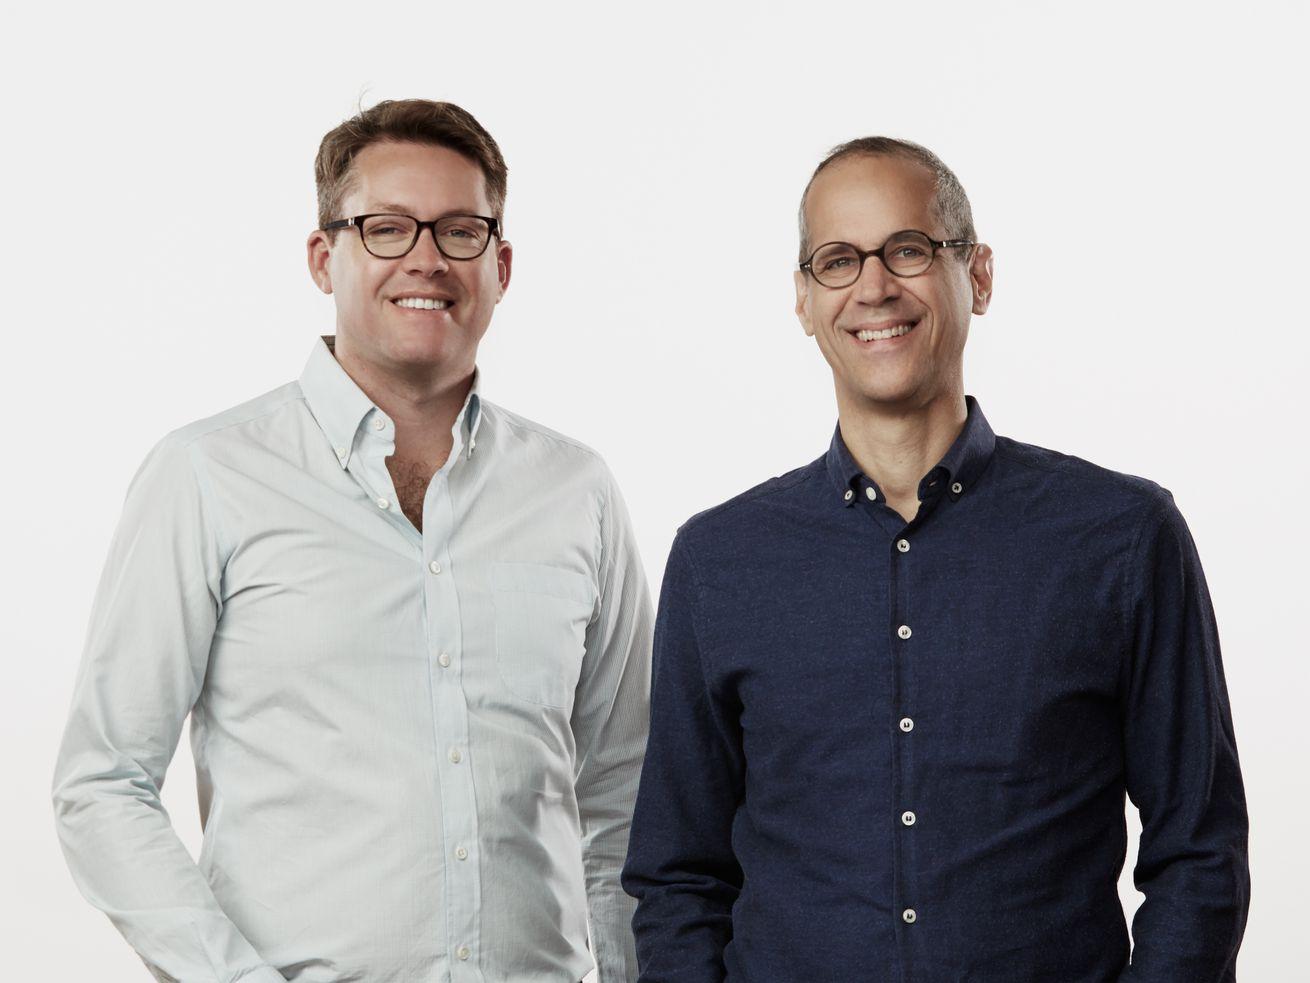 Matt   Alex Headshot for Recode.0 - Full Q&A: Alex Blumberg and Matt Lieber explain why they sold Gimlet to Spotify